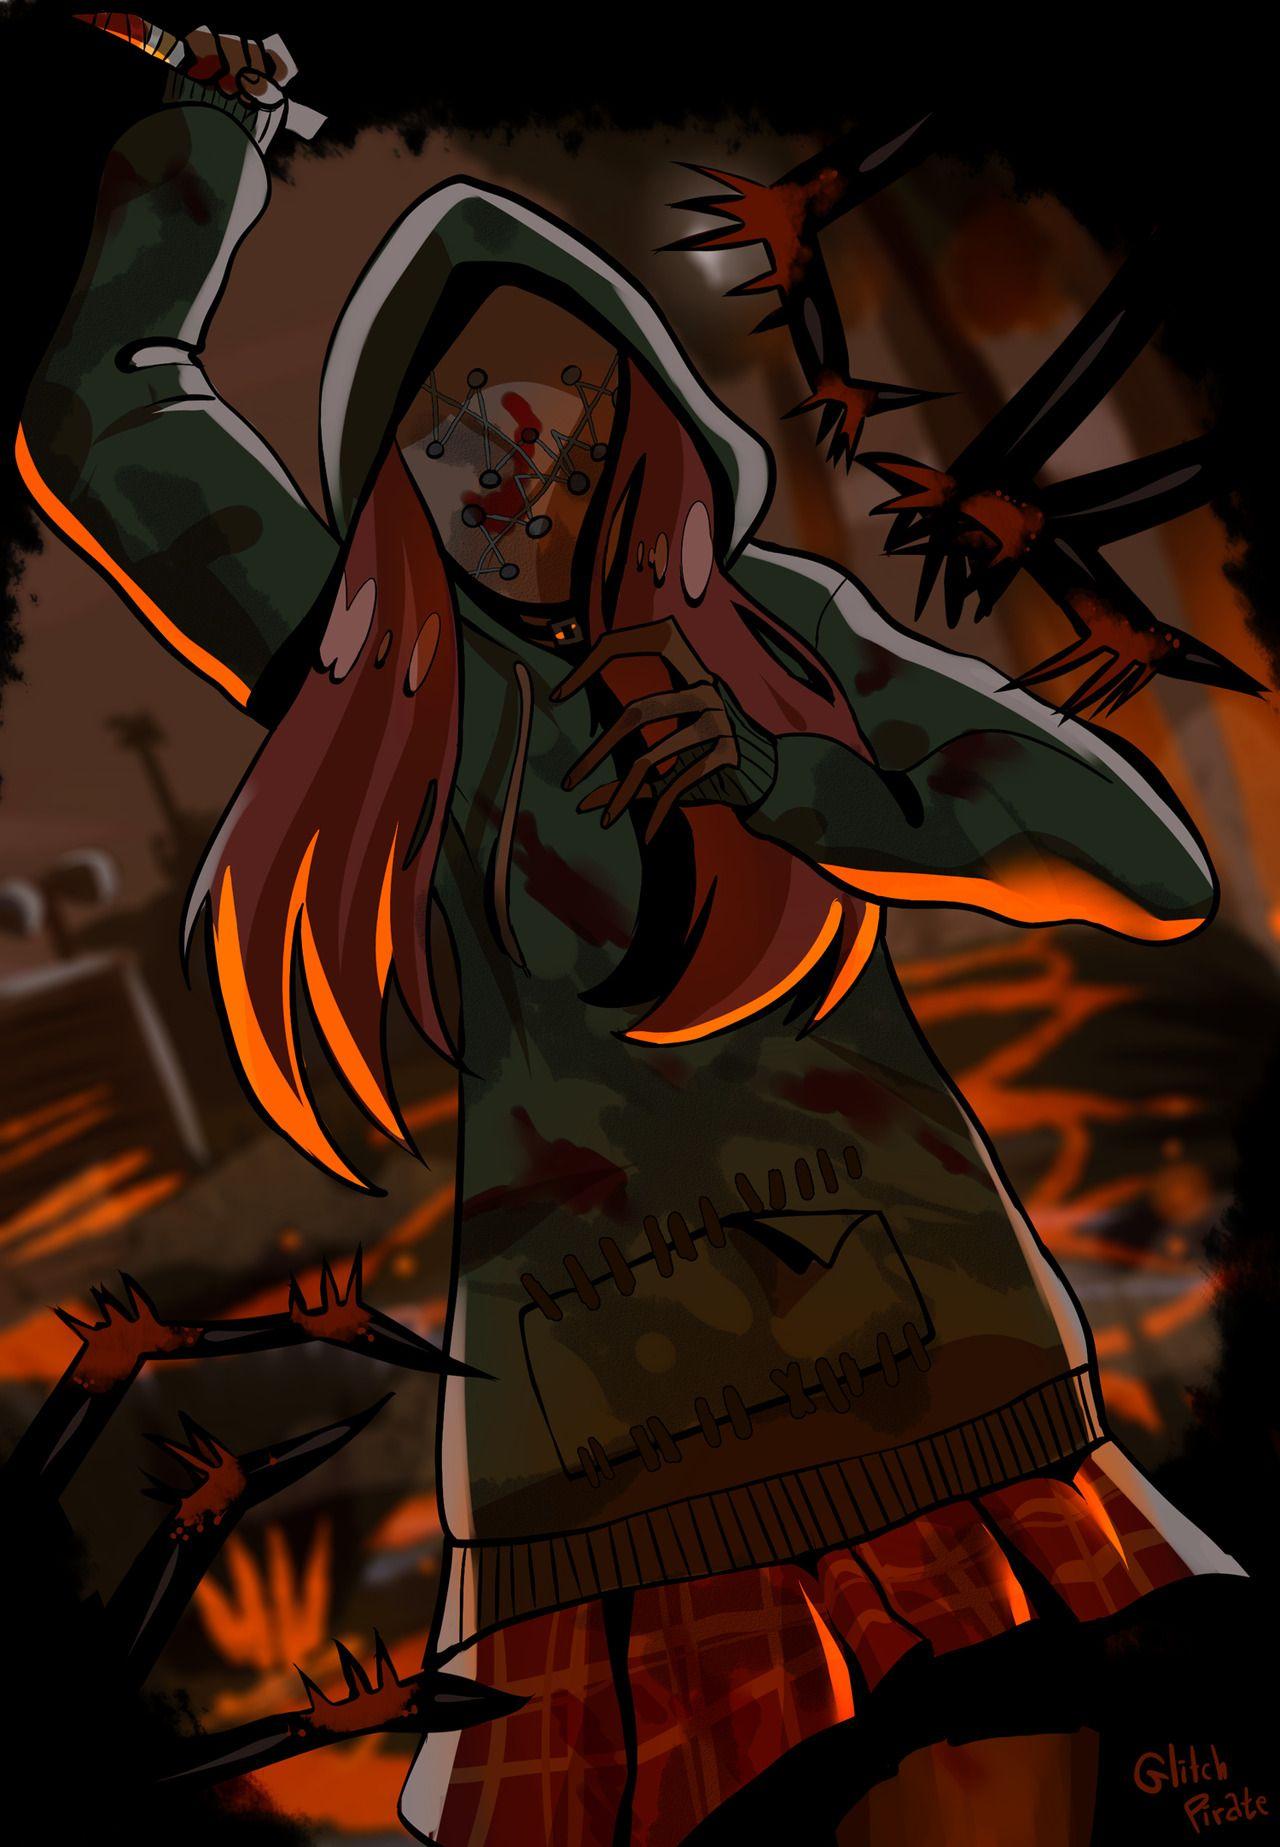 Legiterally A Mess Anime art dark, Creepy pasta comics